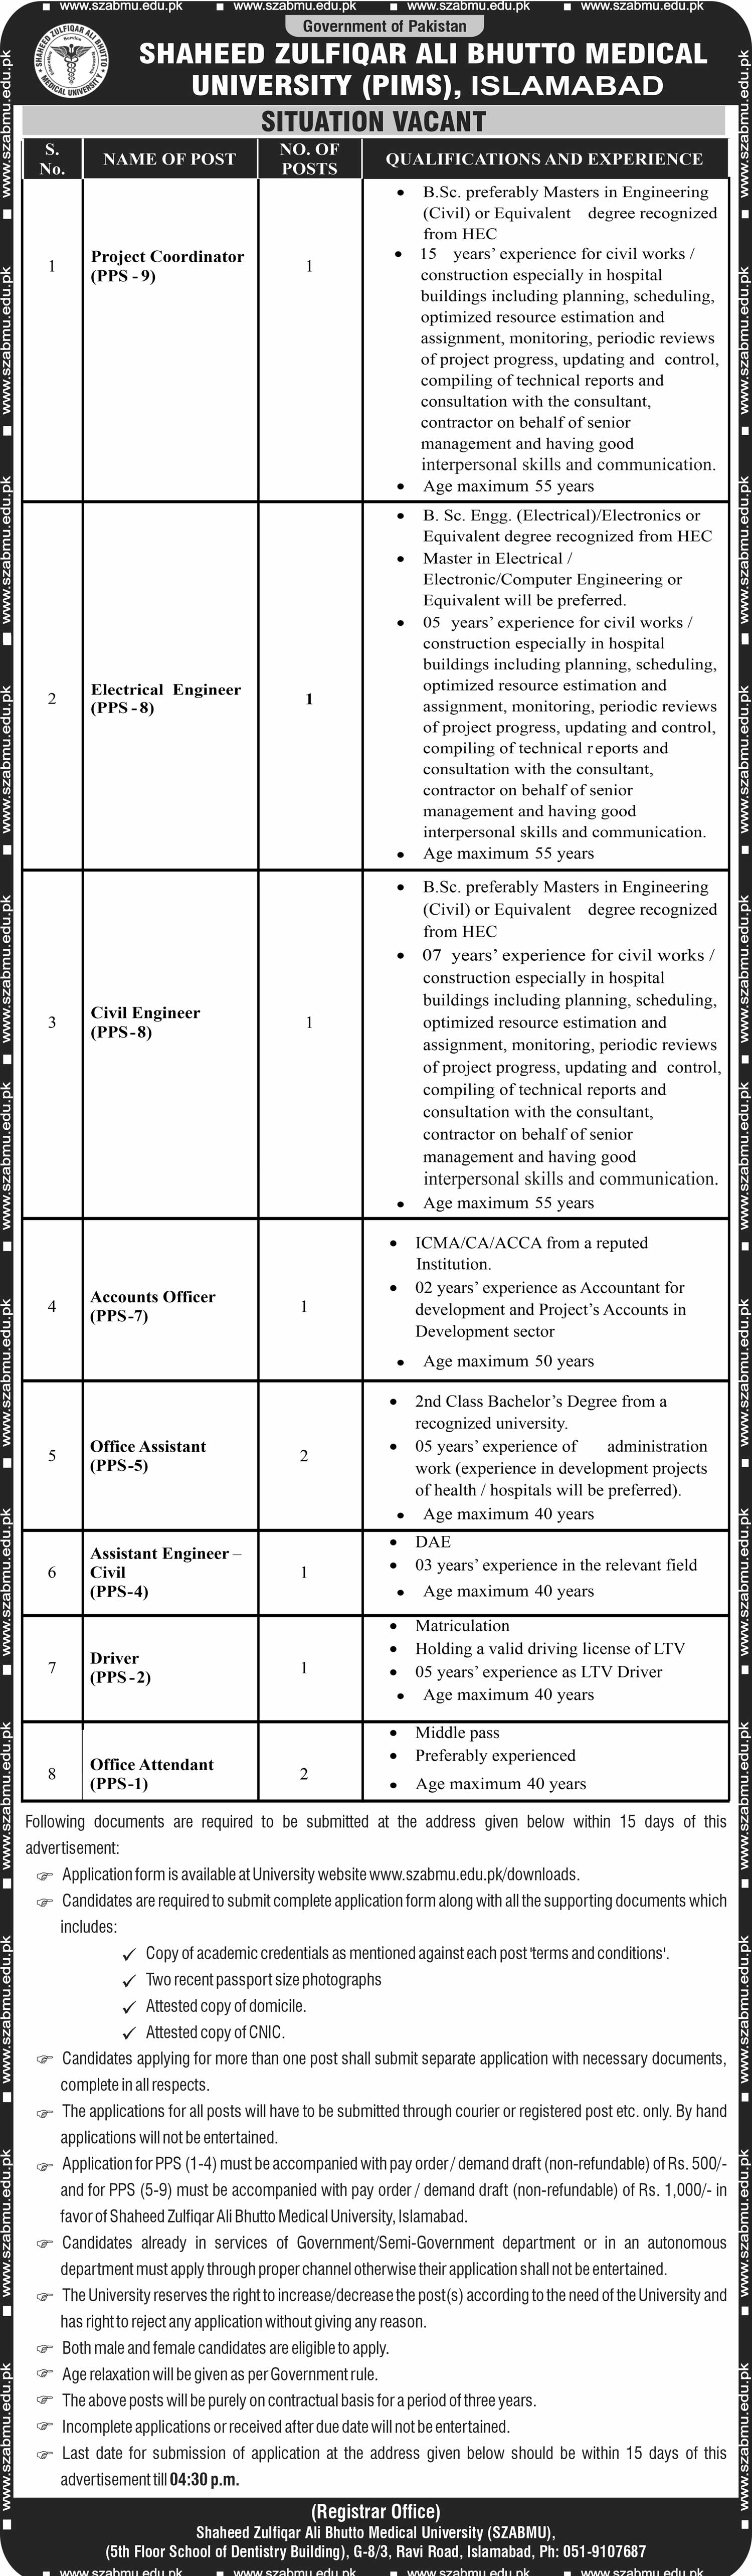 Shaheed Zulfiqar Ali Bhutto Medical University Jobs 2021